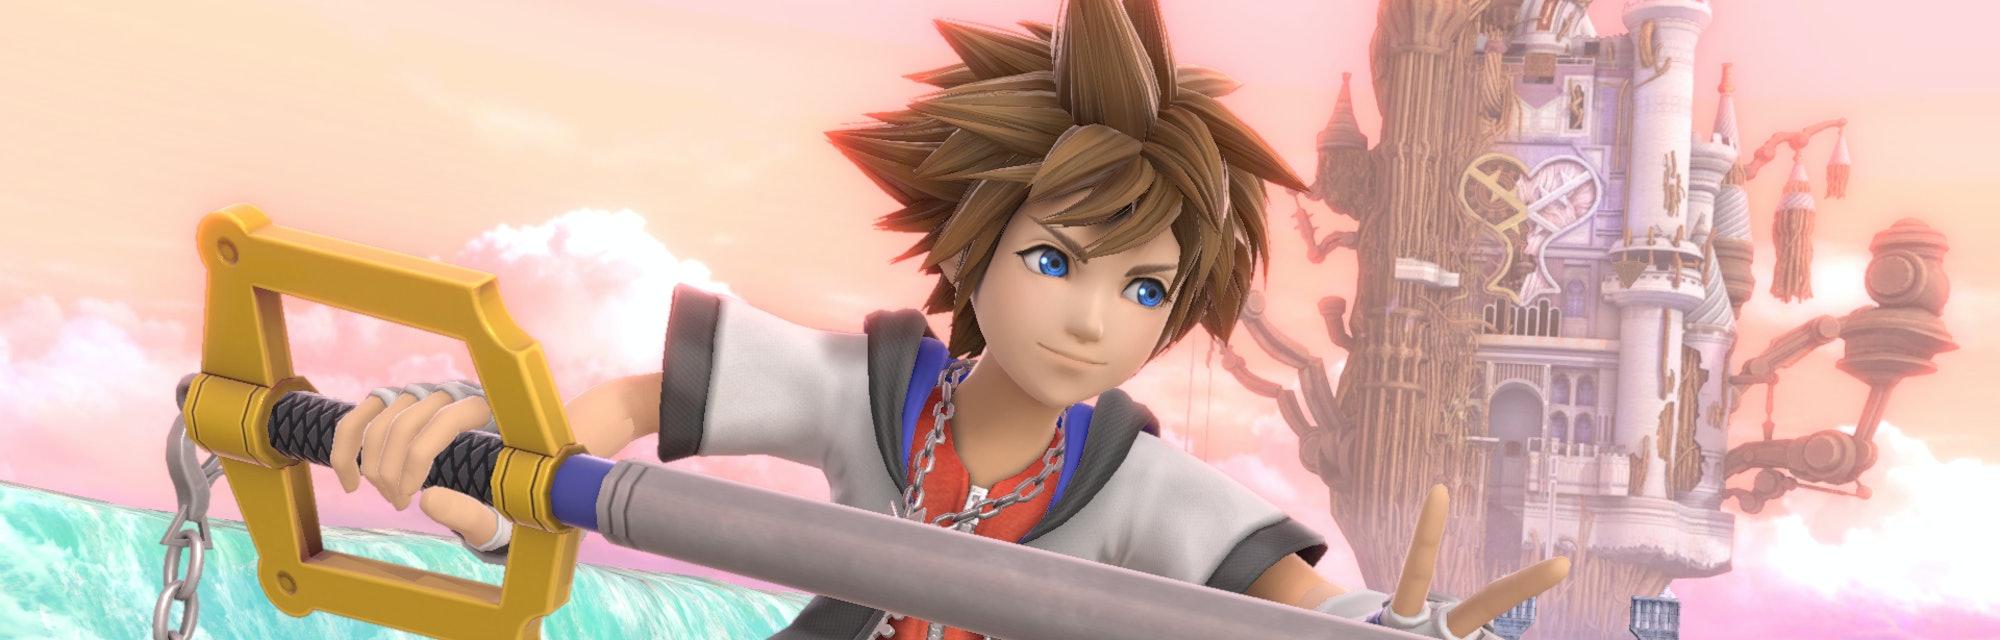 sora smash ultimate close up screenshot